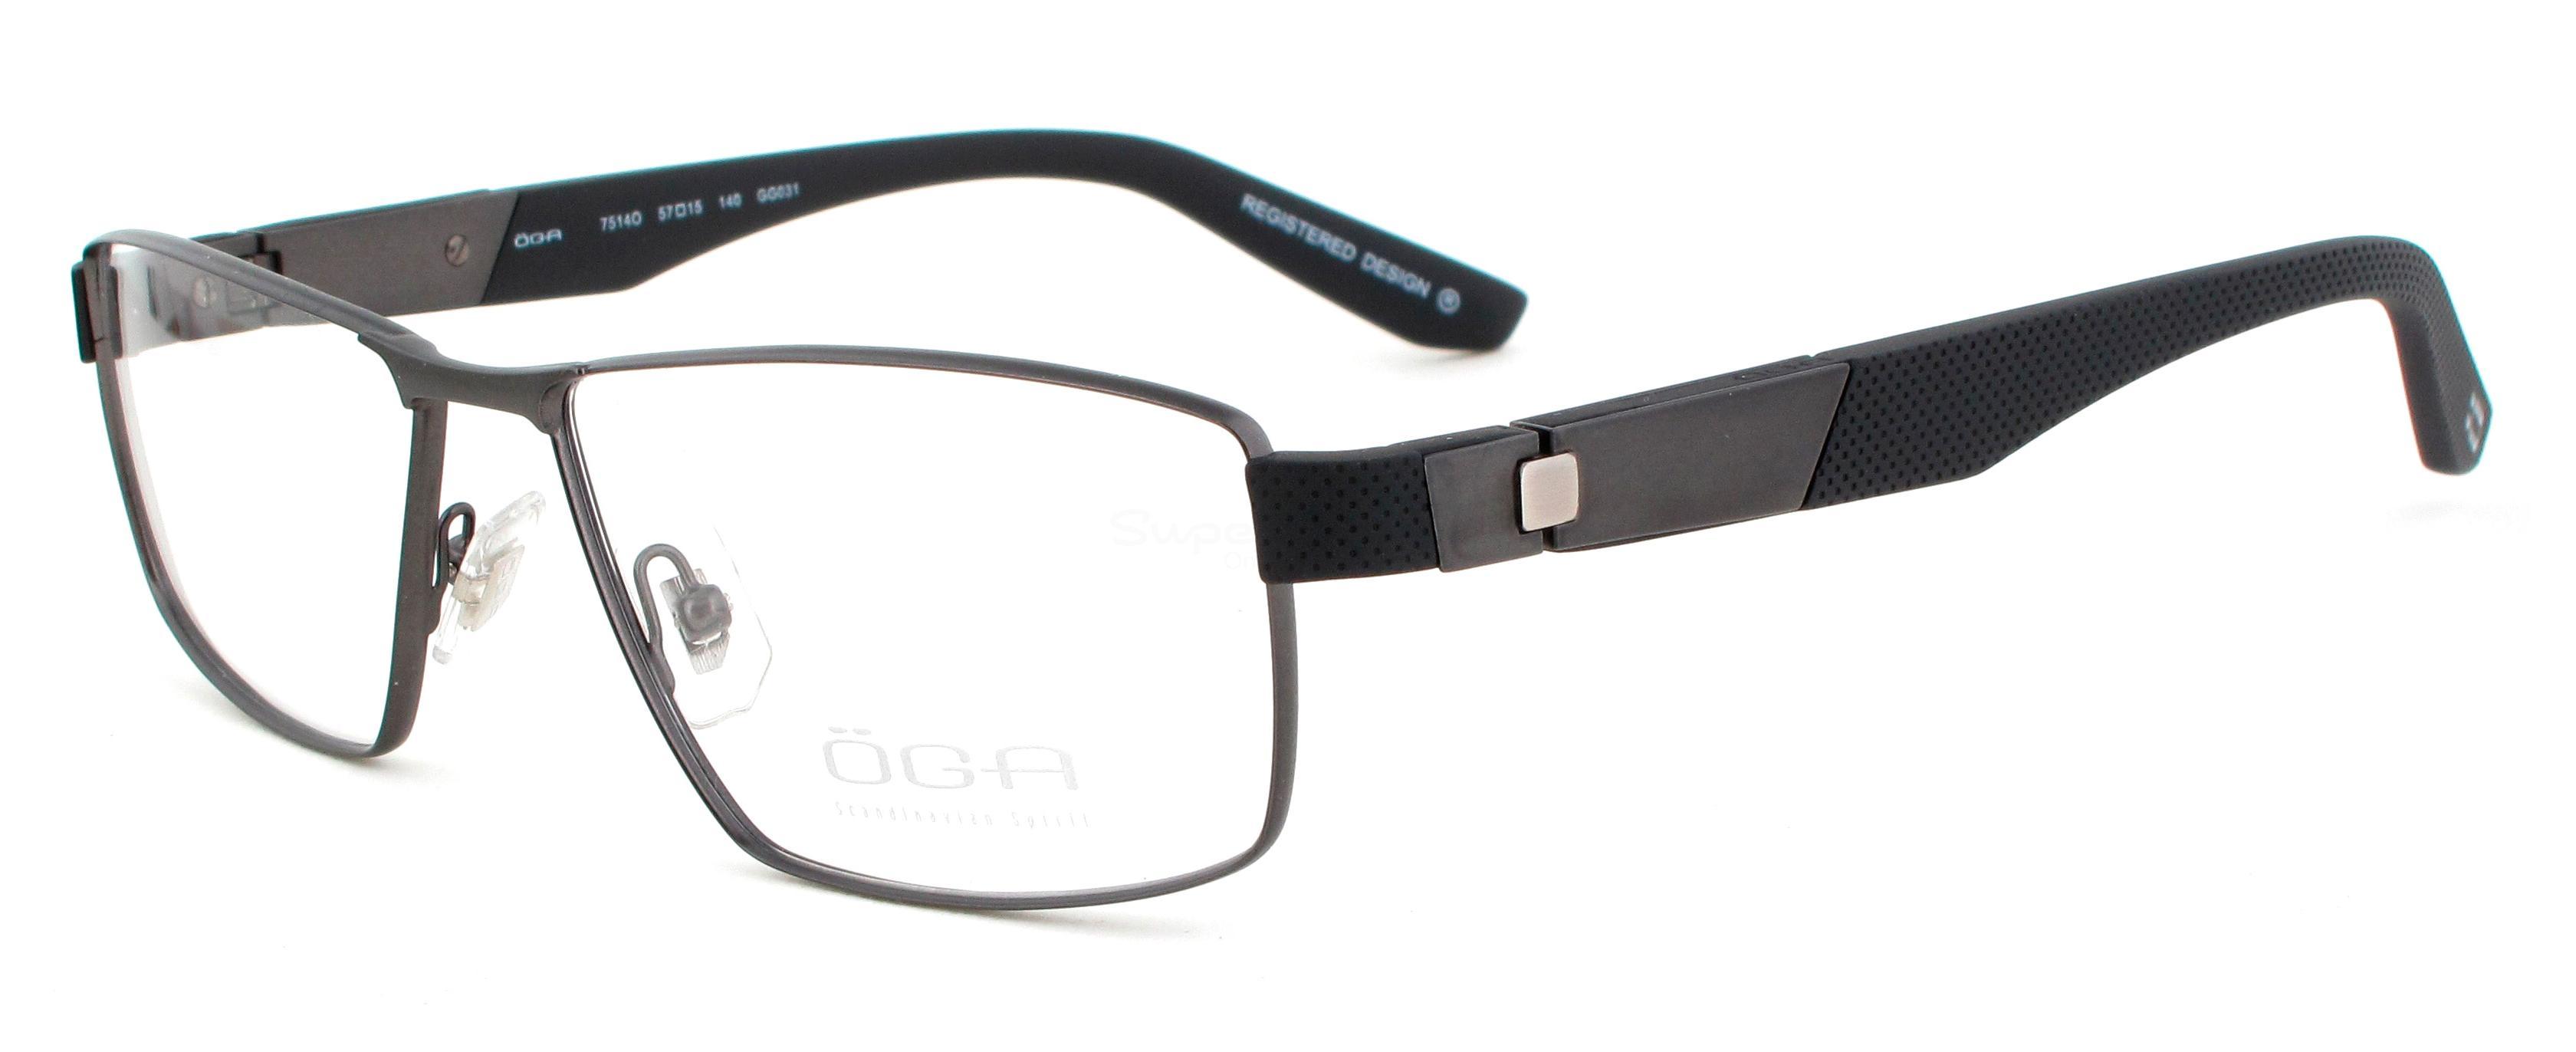 GG031 7514O FALK 3 Glasses, ÖGA Scandinavian Spirit